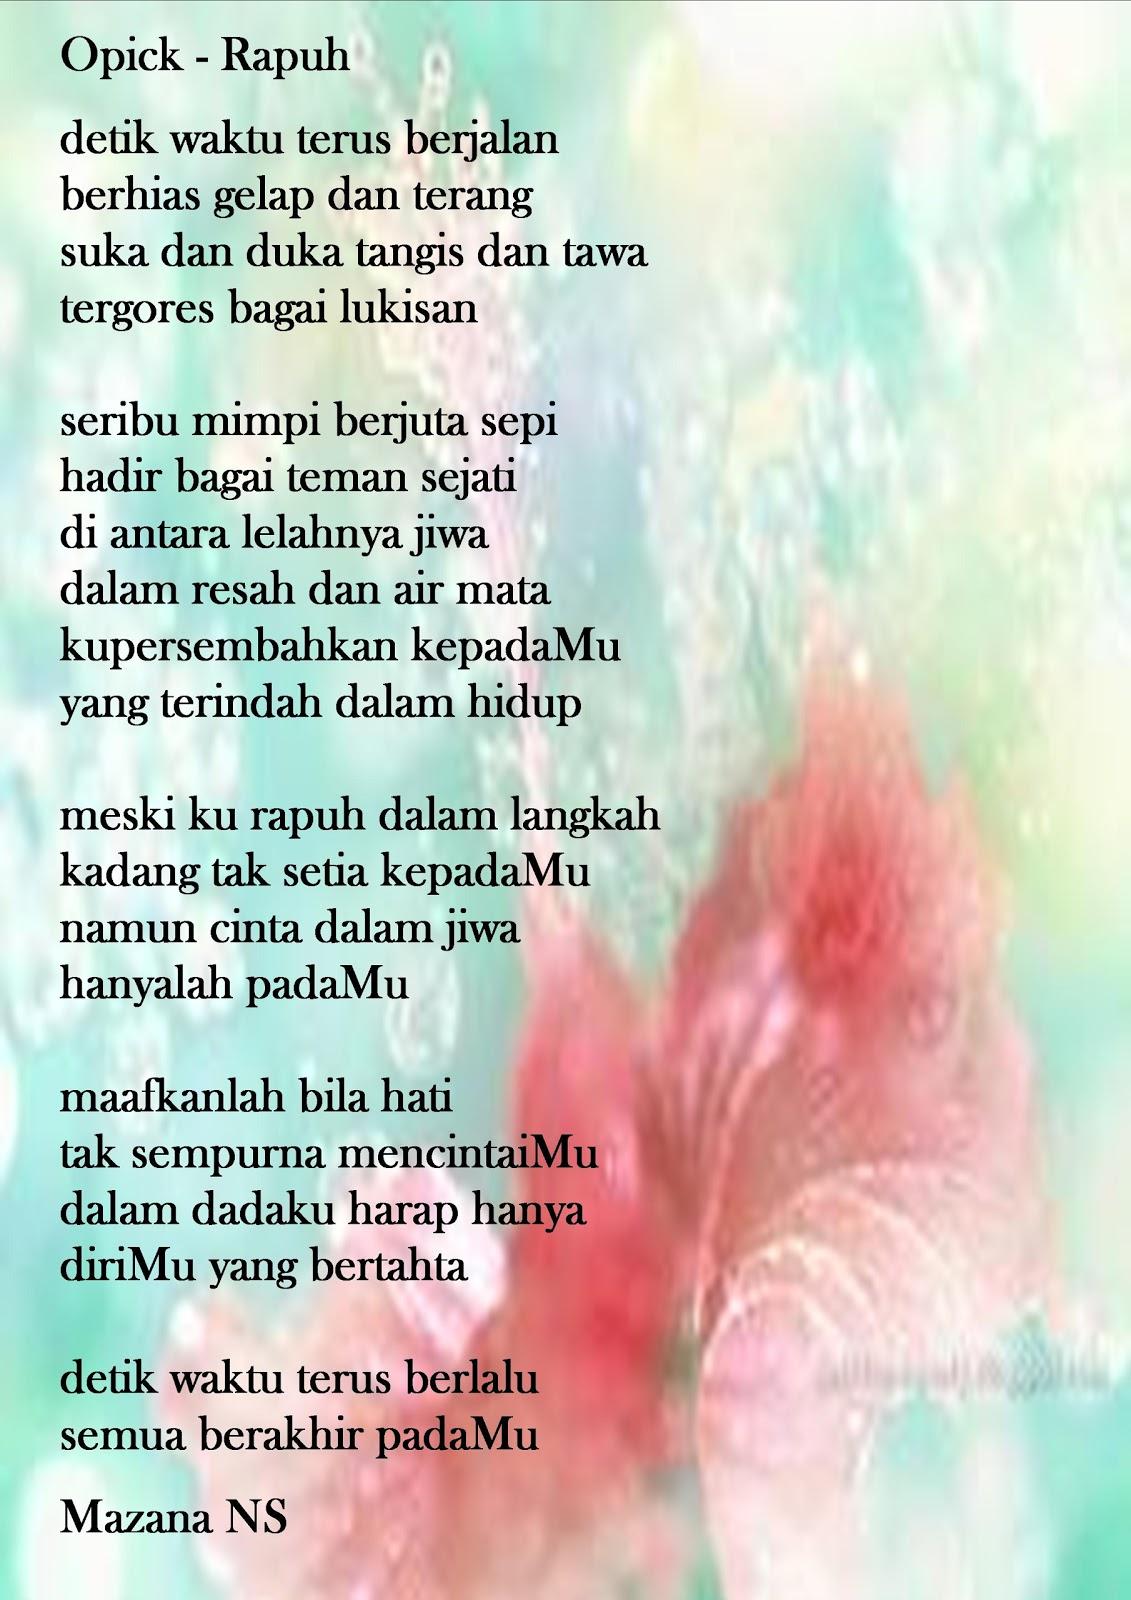 Opick-Rapuh (Lirik)